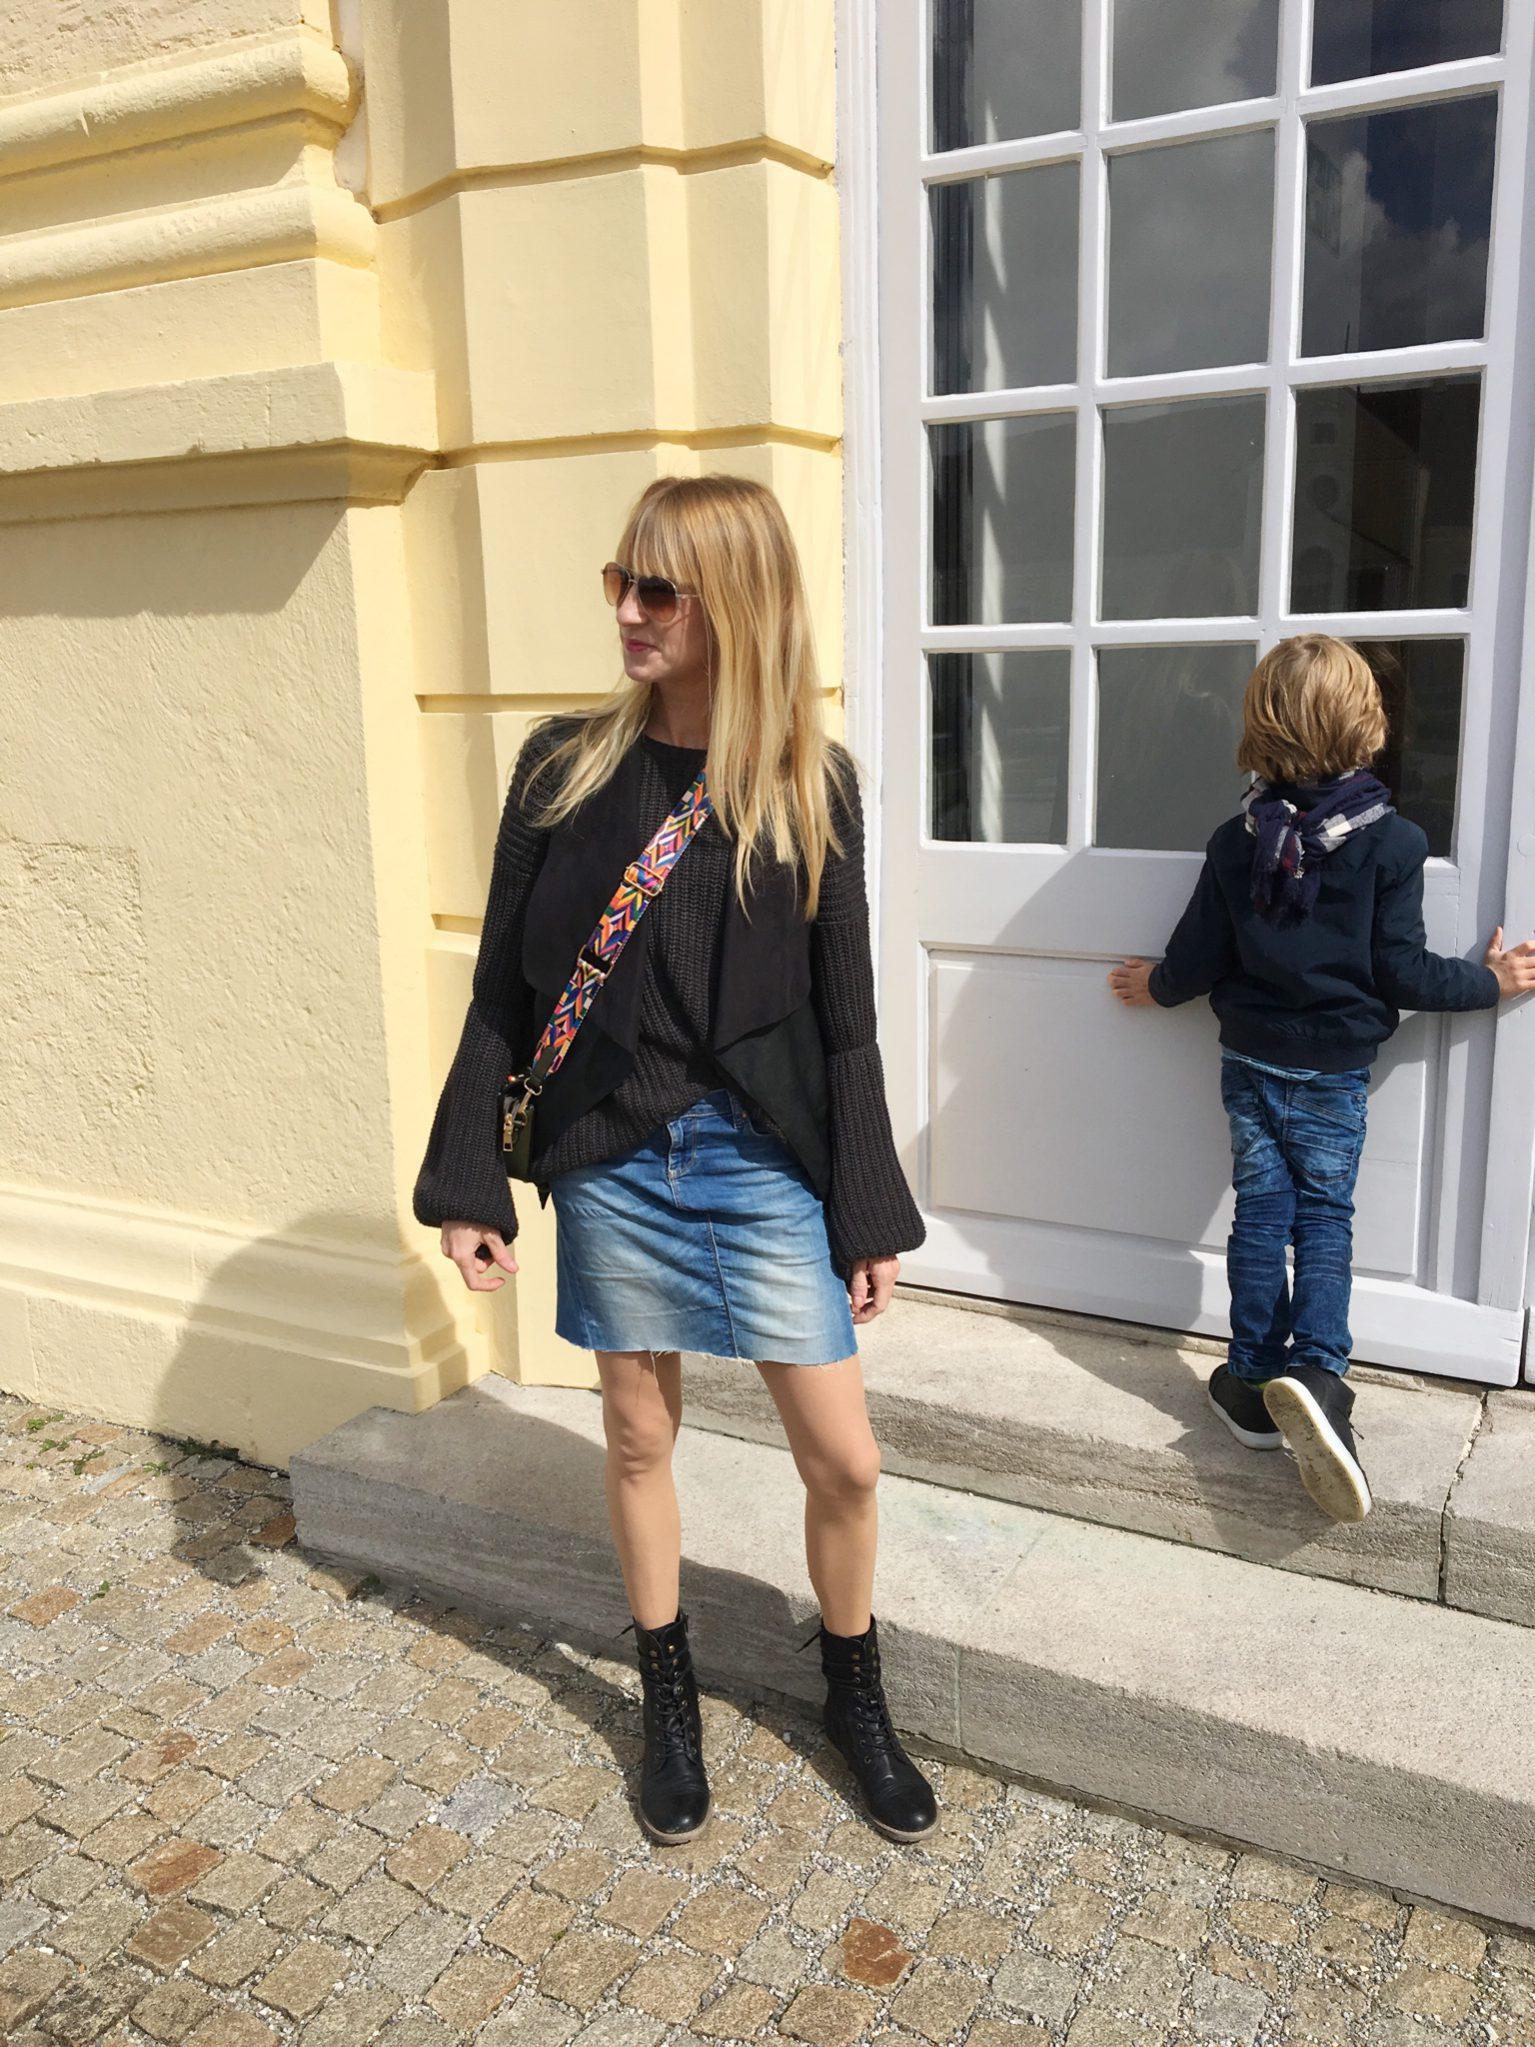 Jeansrock selbstgemacht, Jeansrock, DIY, Nähen, Mamablog, Modemama, Herbstlook, Familienzeit, Modeblog, Strickpulli